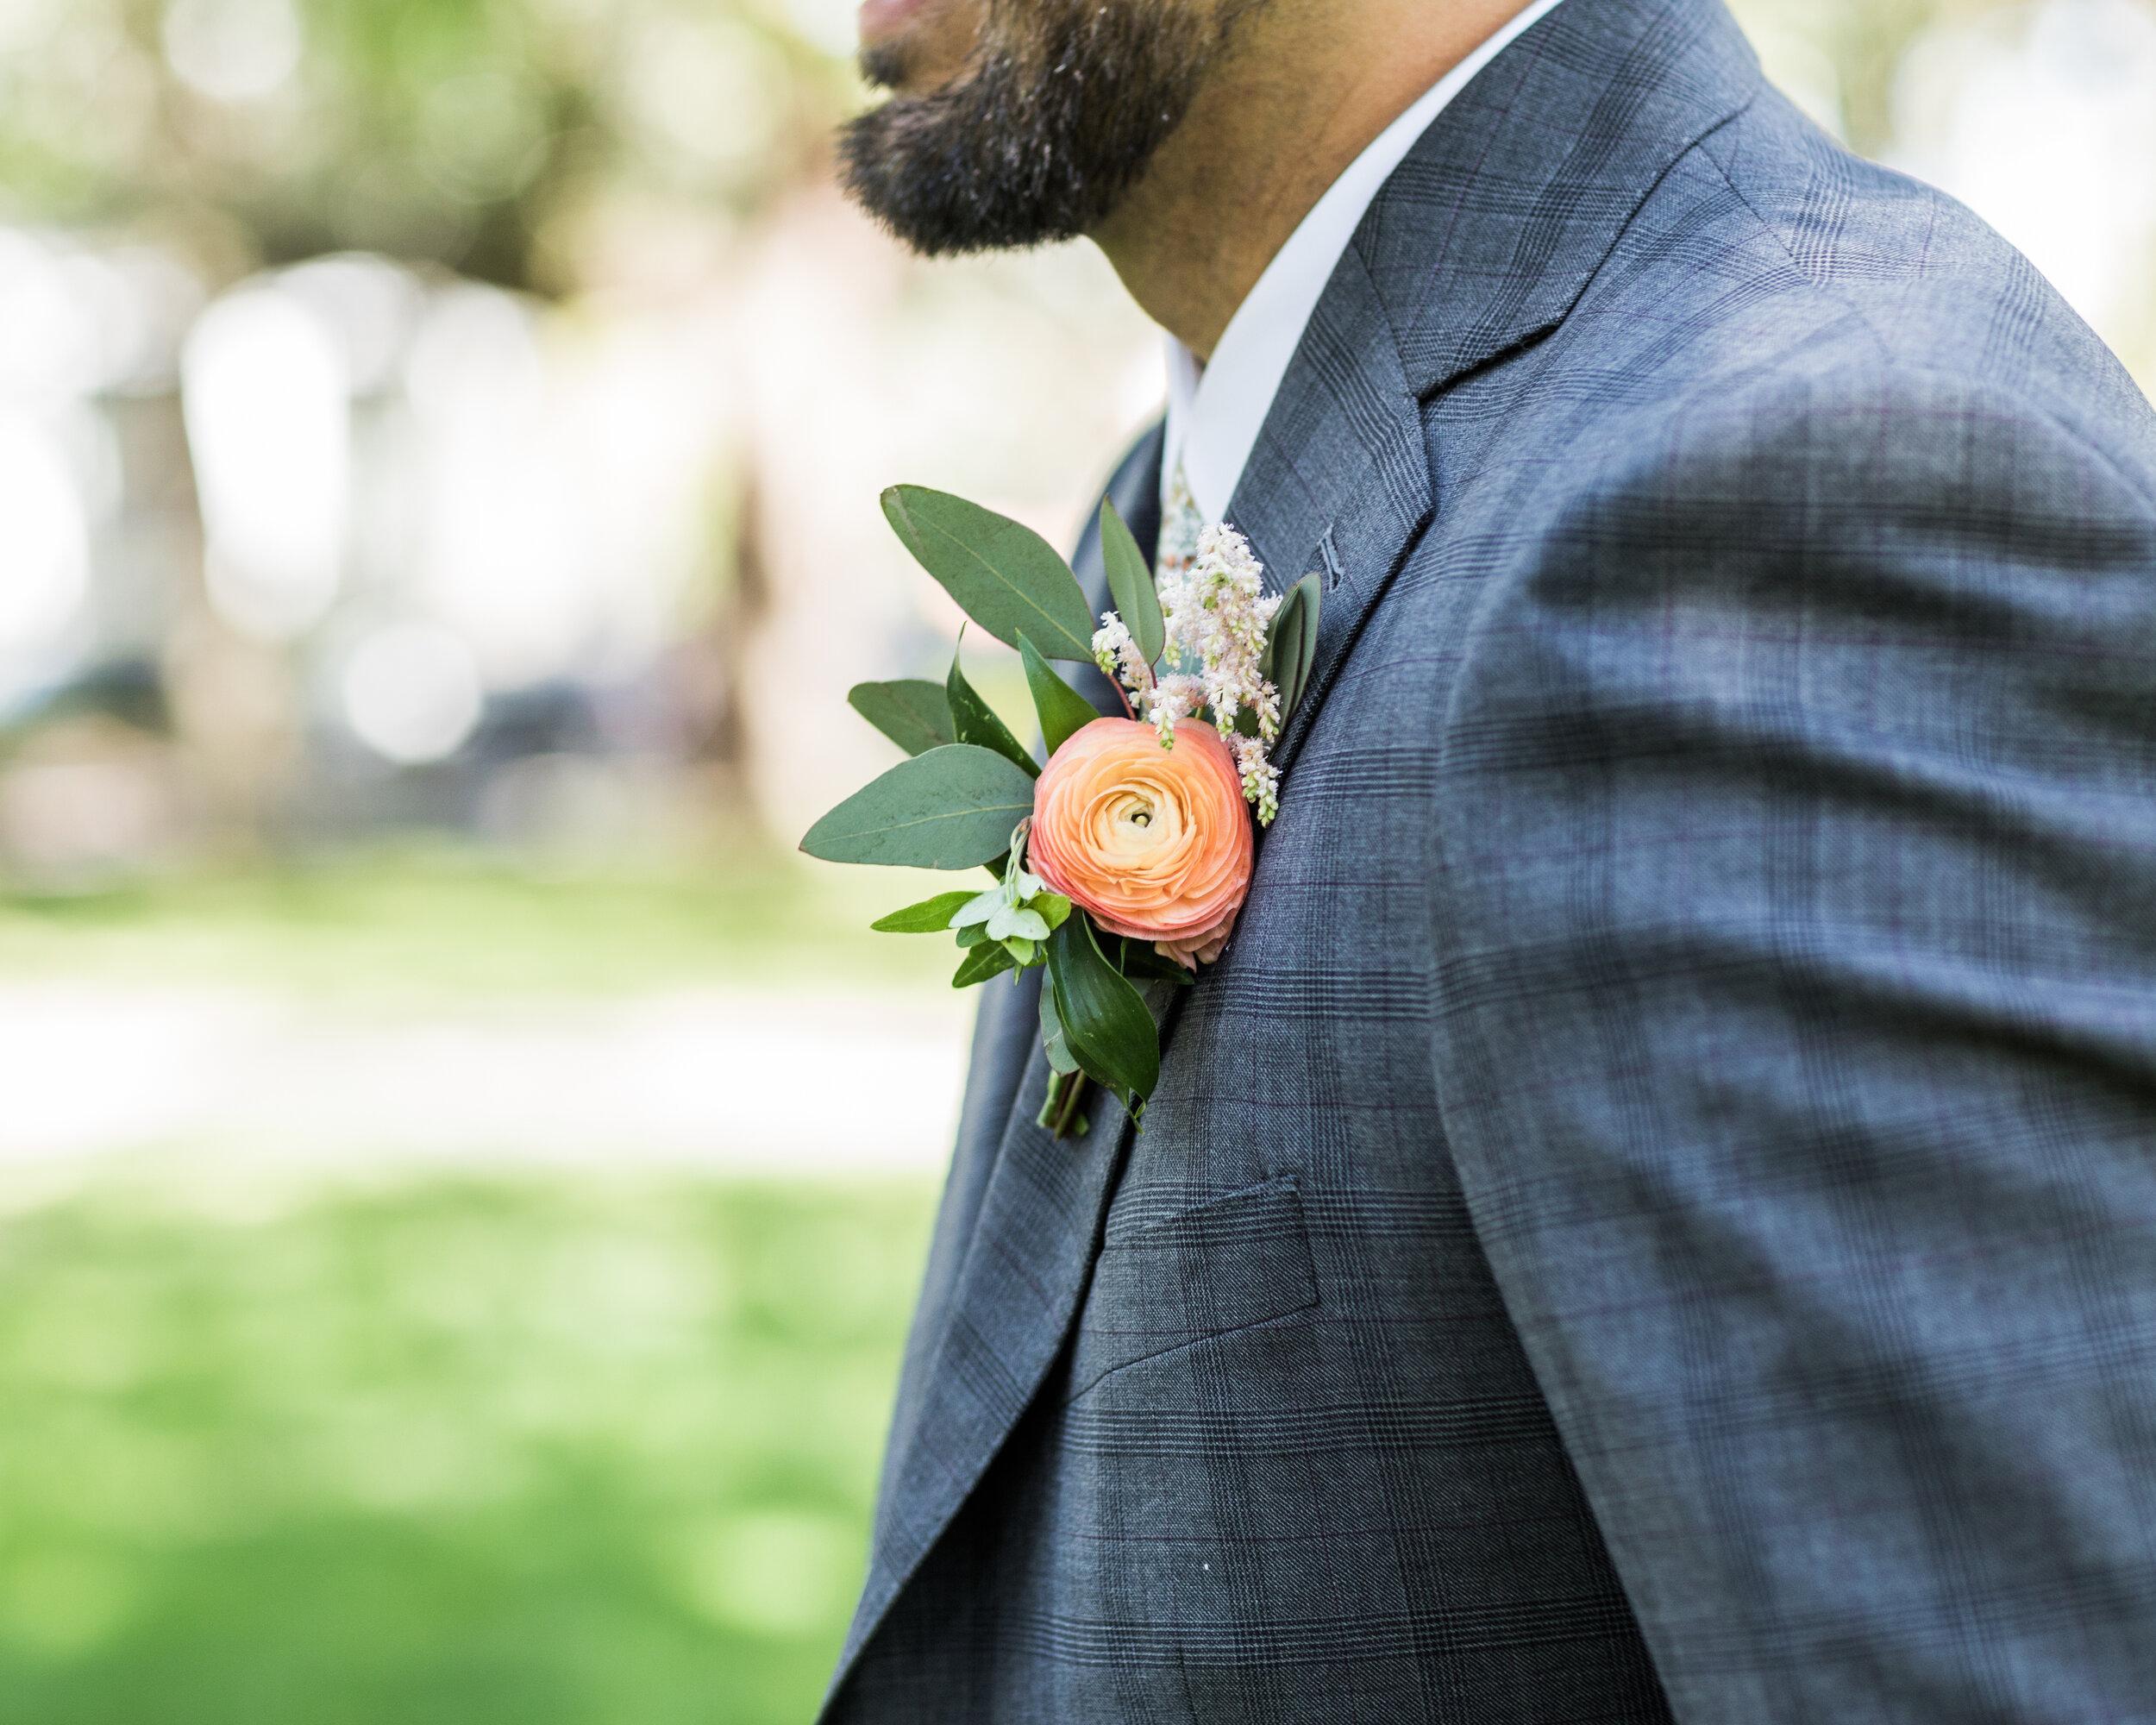 ivory-and-beau-blog-weddings-ivory-and-beau-couple-dominique-and-andres-savannah-florist-wedding-planning-savannah-bridal-boutique-wedding-flowers-KIP_WEBERWEDDING_RAILROADMUSEUM-431.JPG